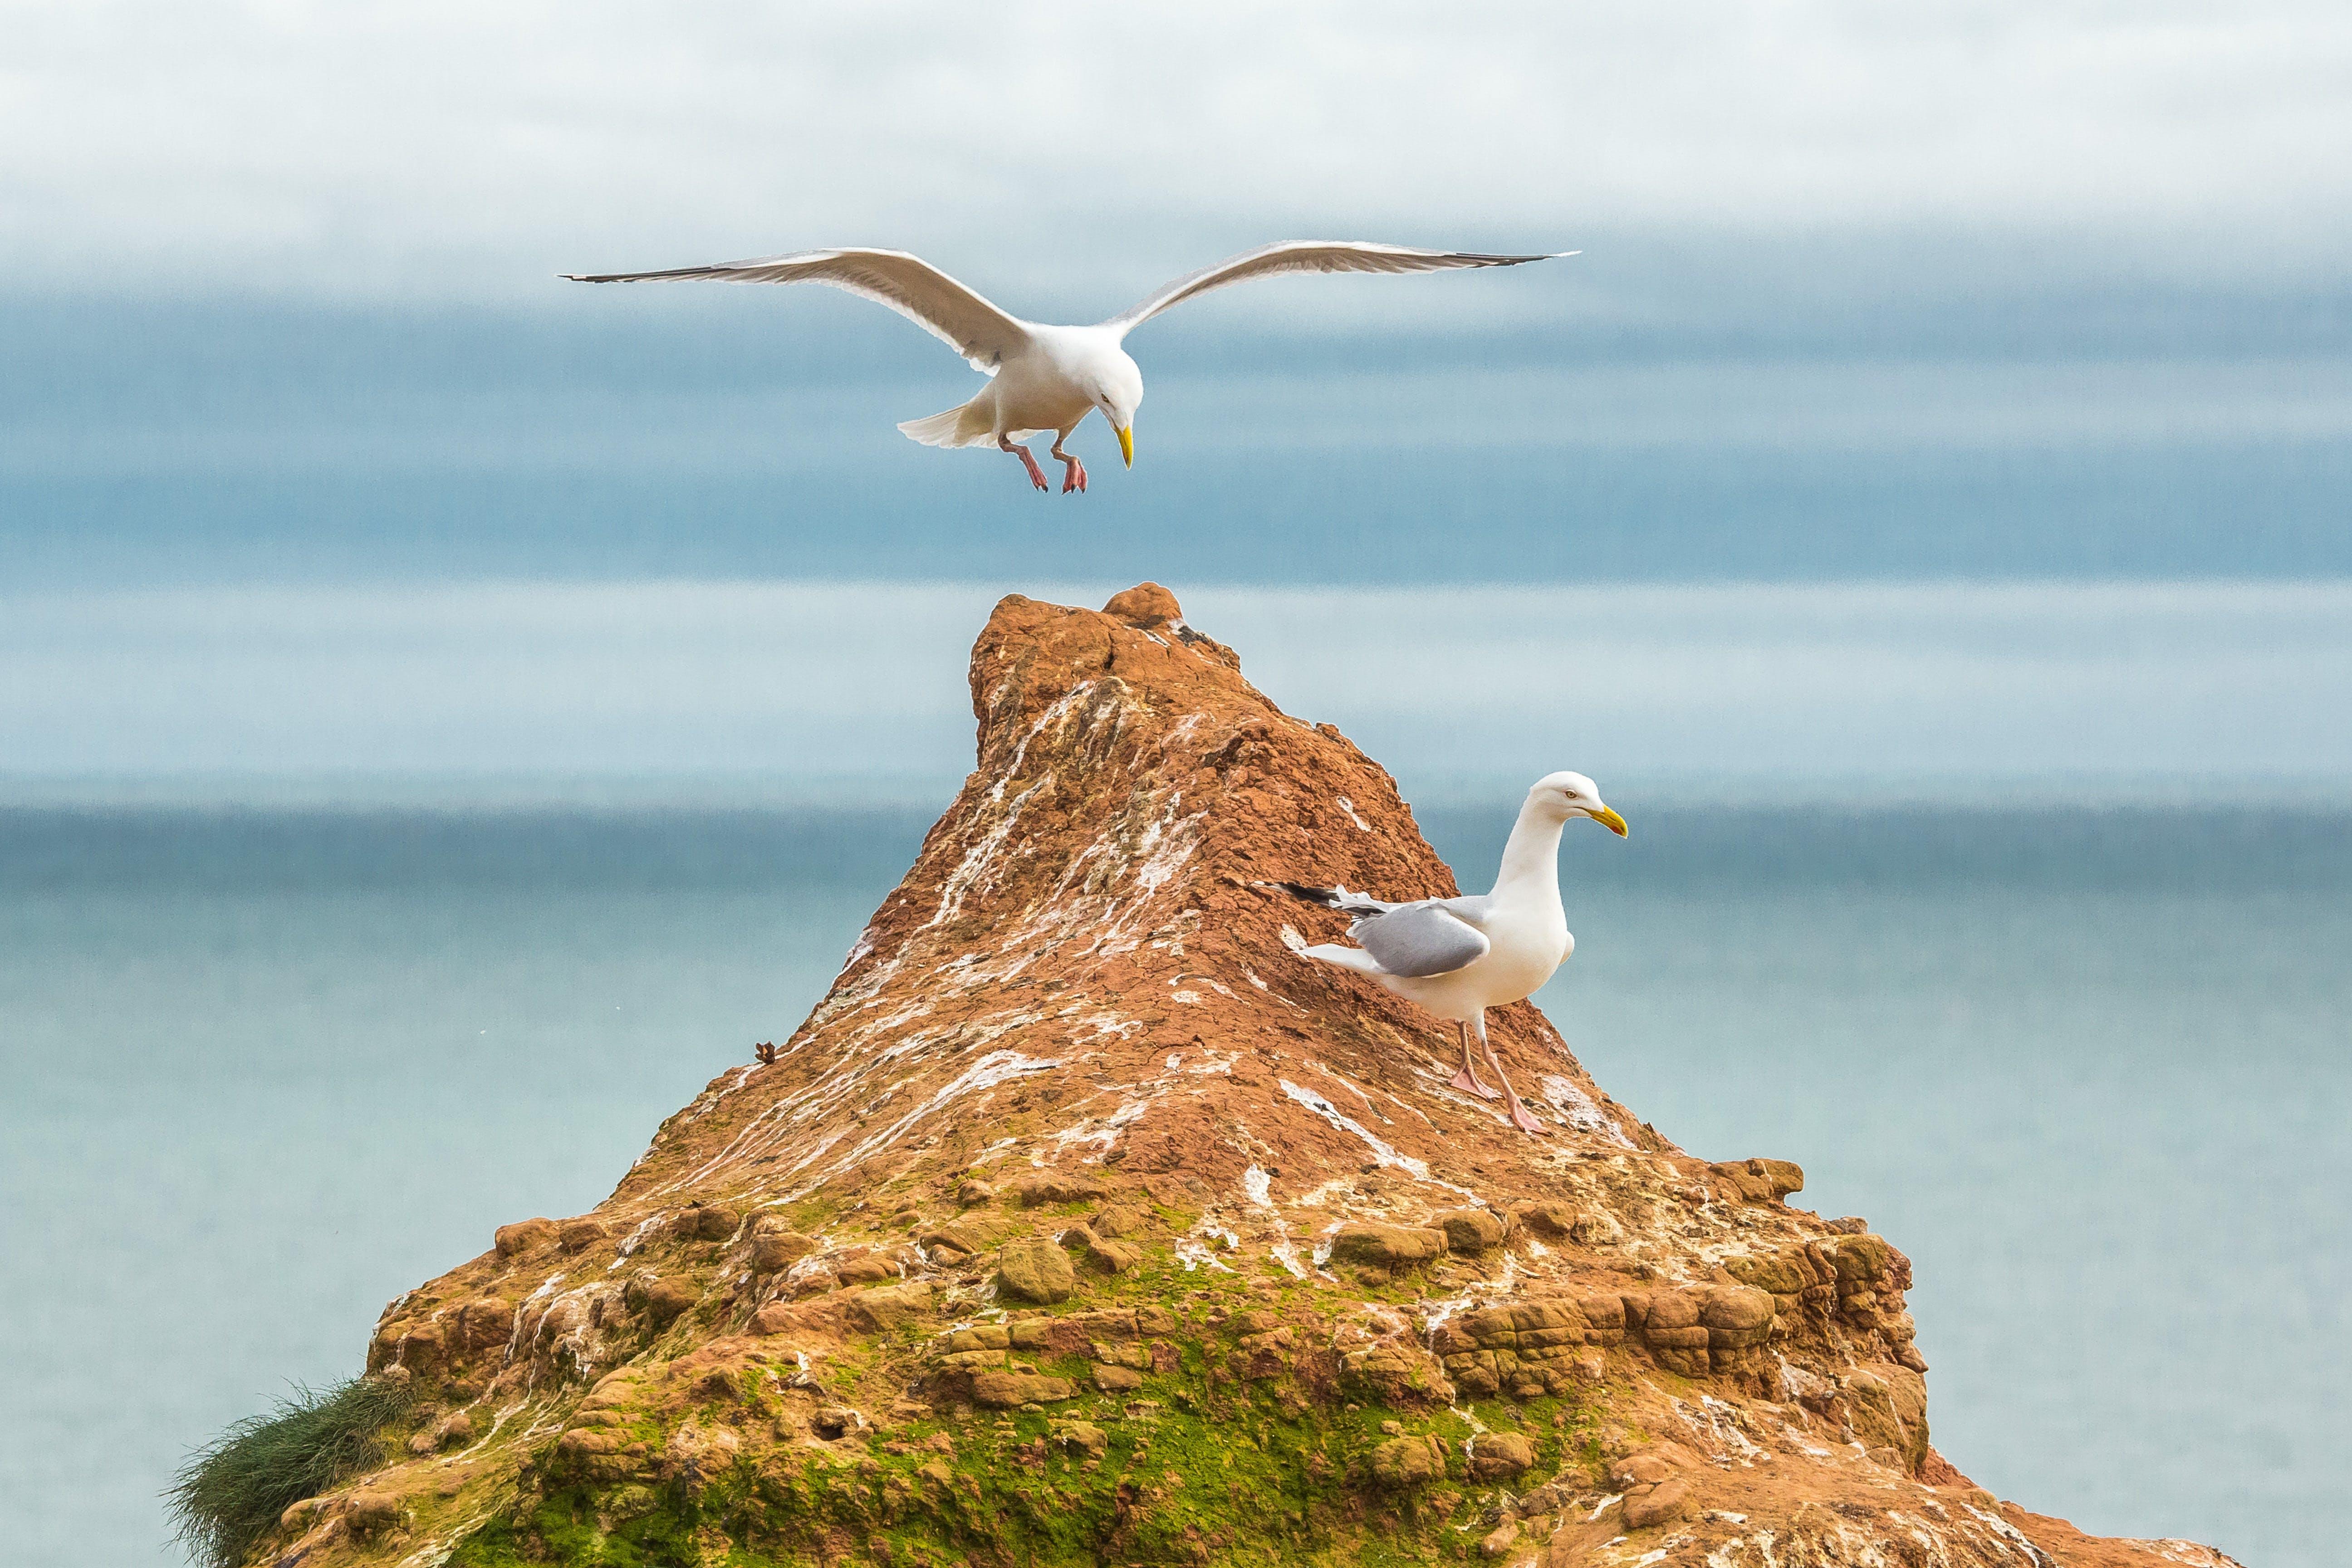 White Seagulls